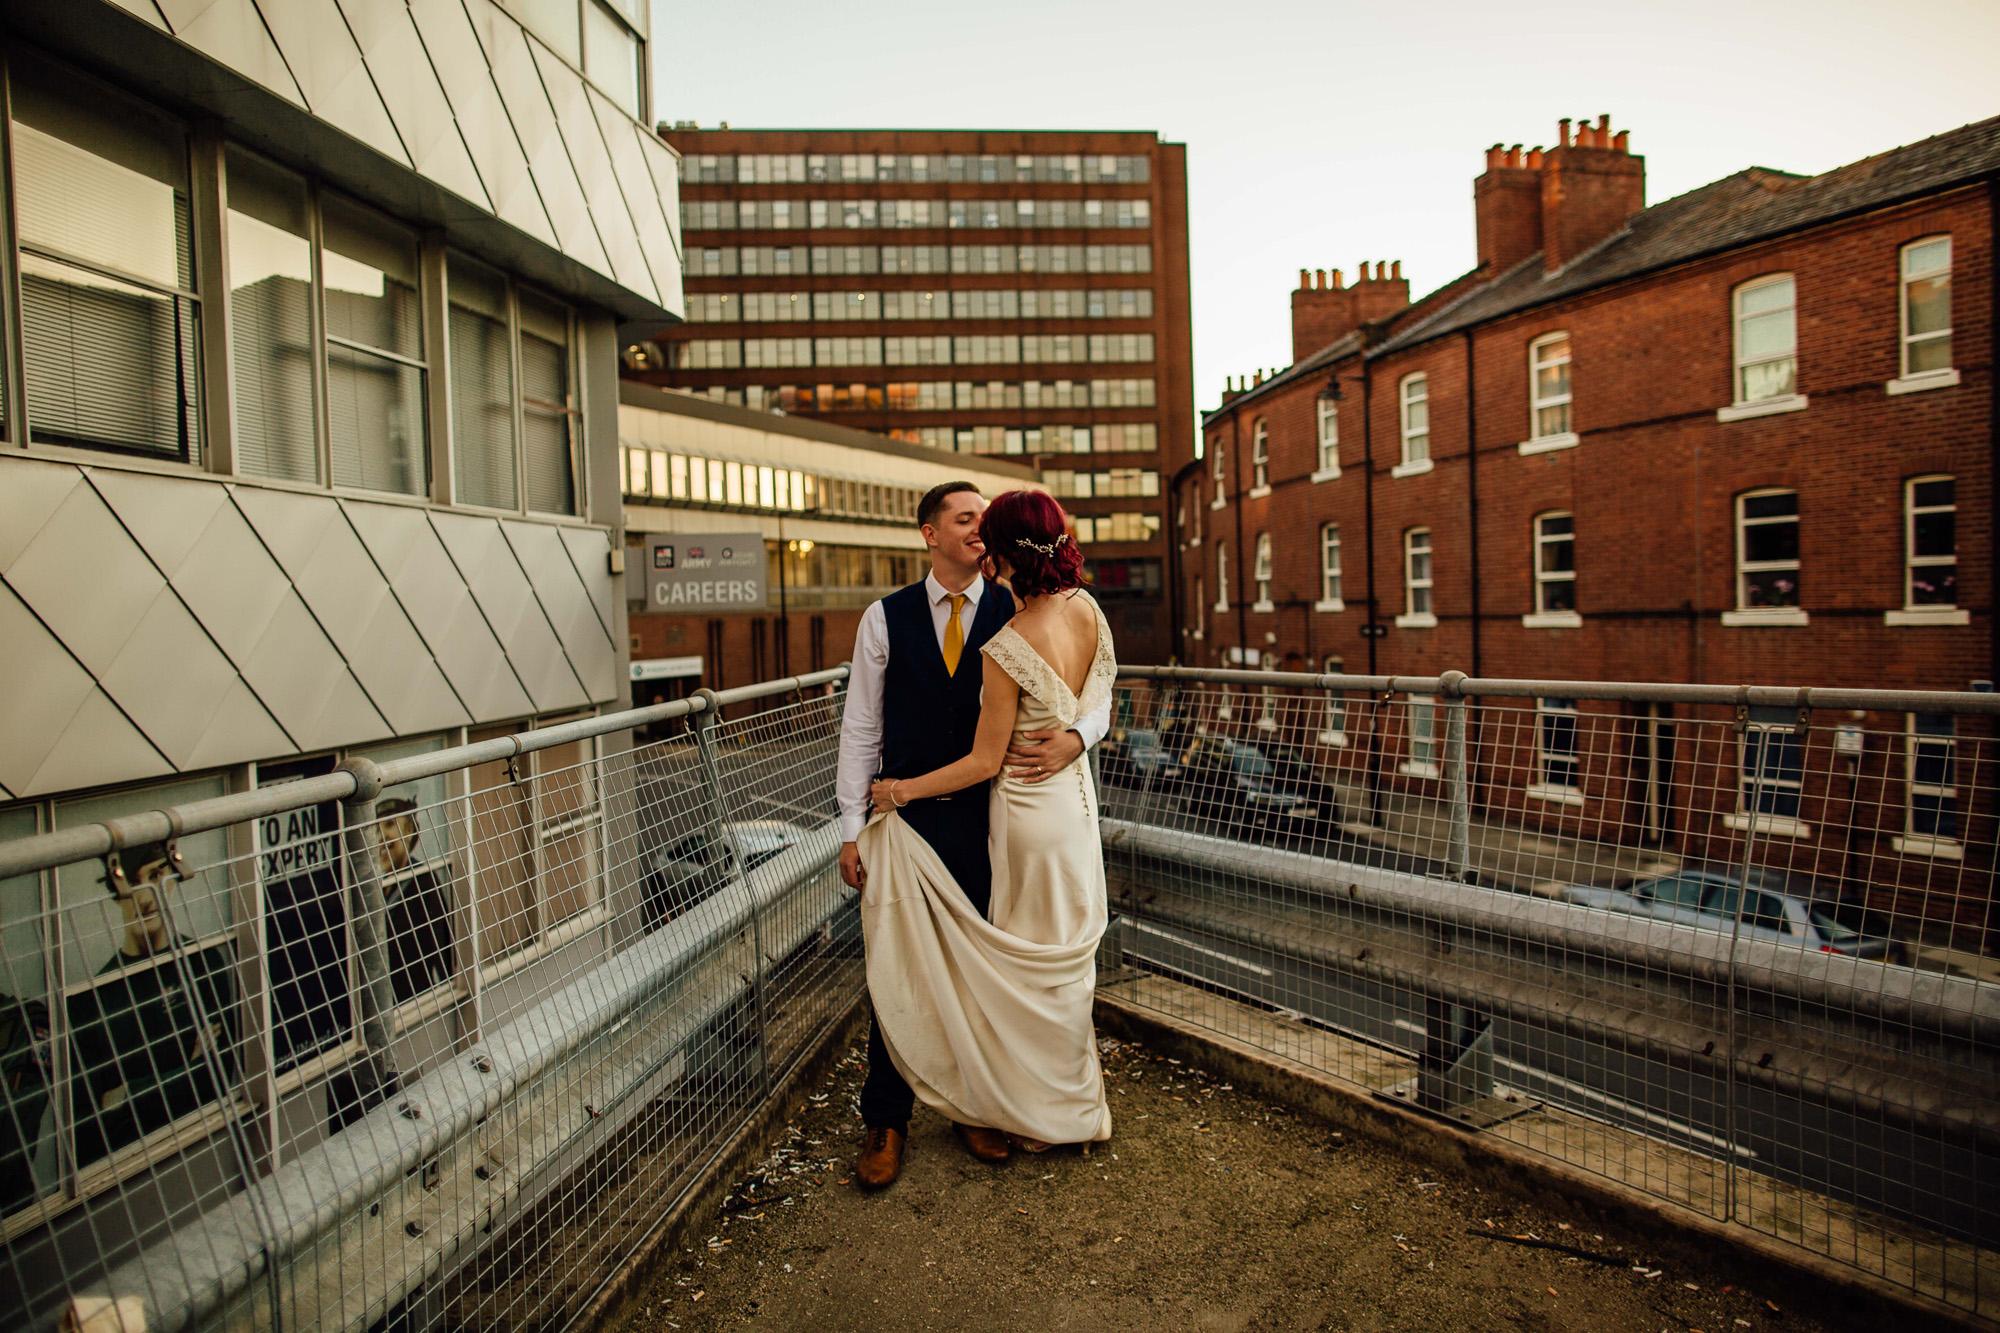 Sarah-Honeysuckle-Bias-Cut-Silk-Vintage-Inspired-Wedding-Gown-Sheffield-Wedding-Kate-Beaumont-66.jpg